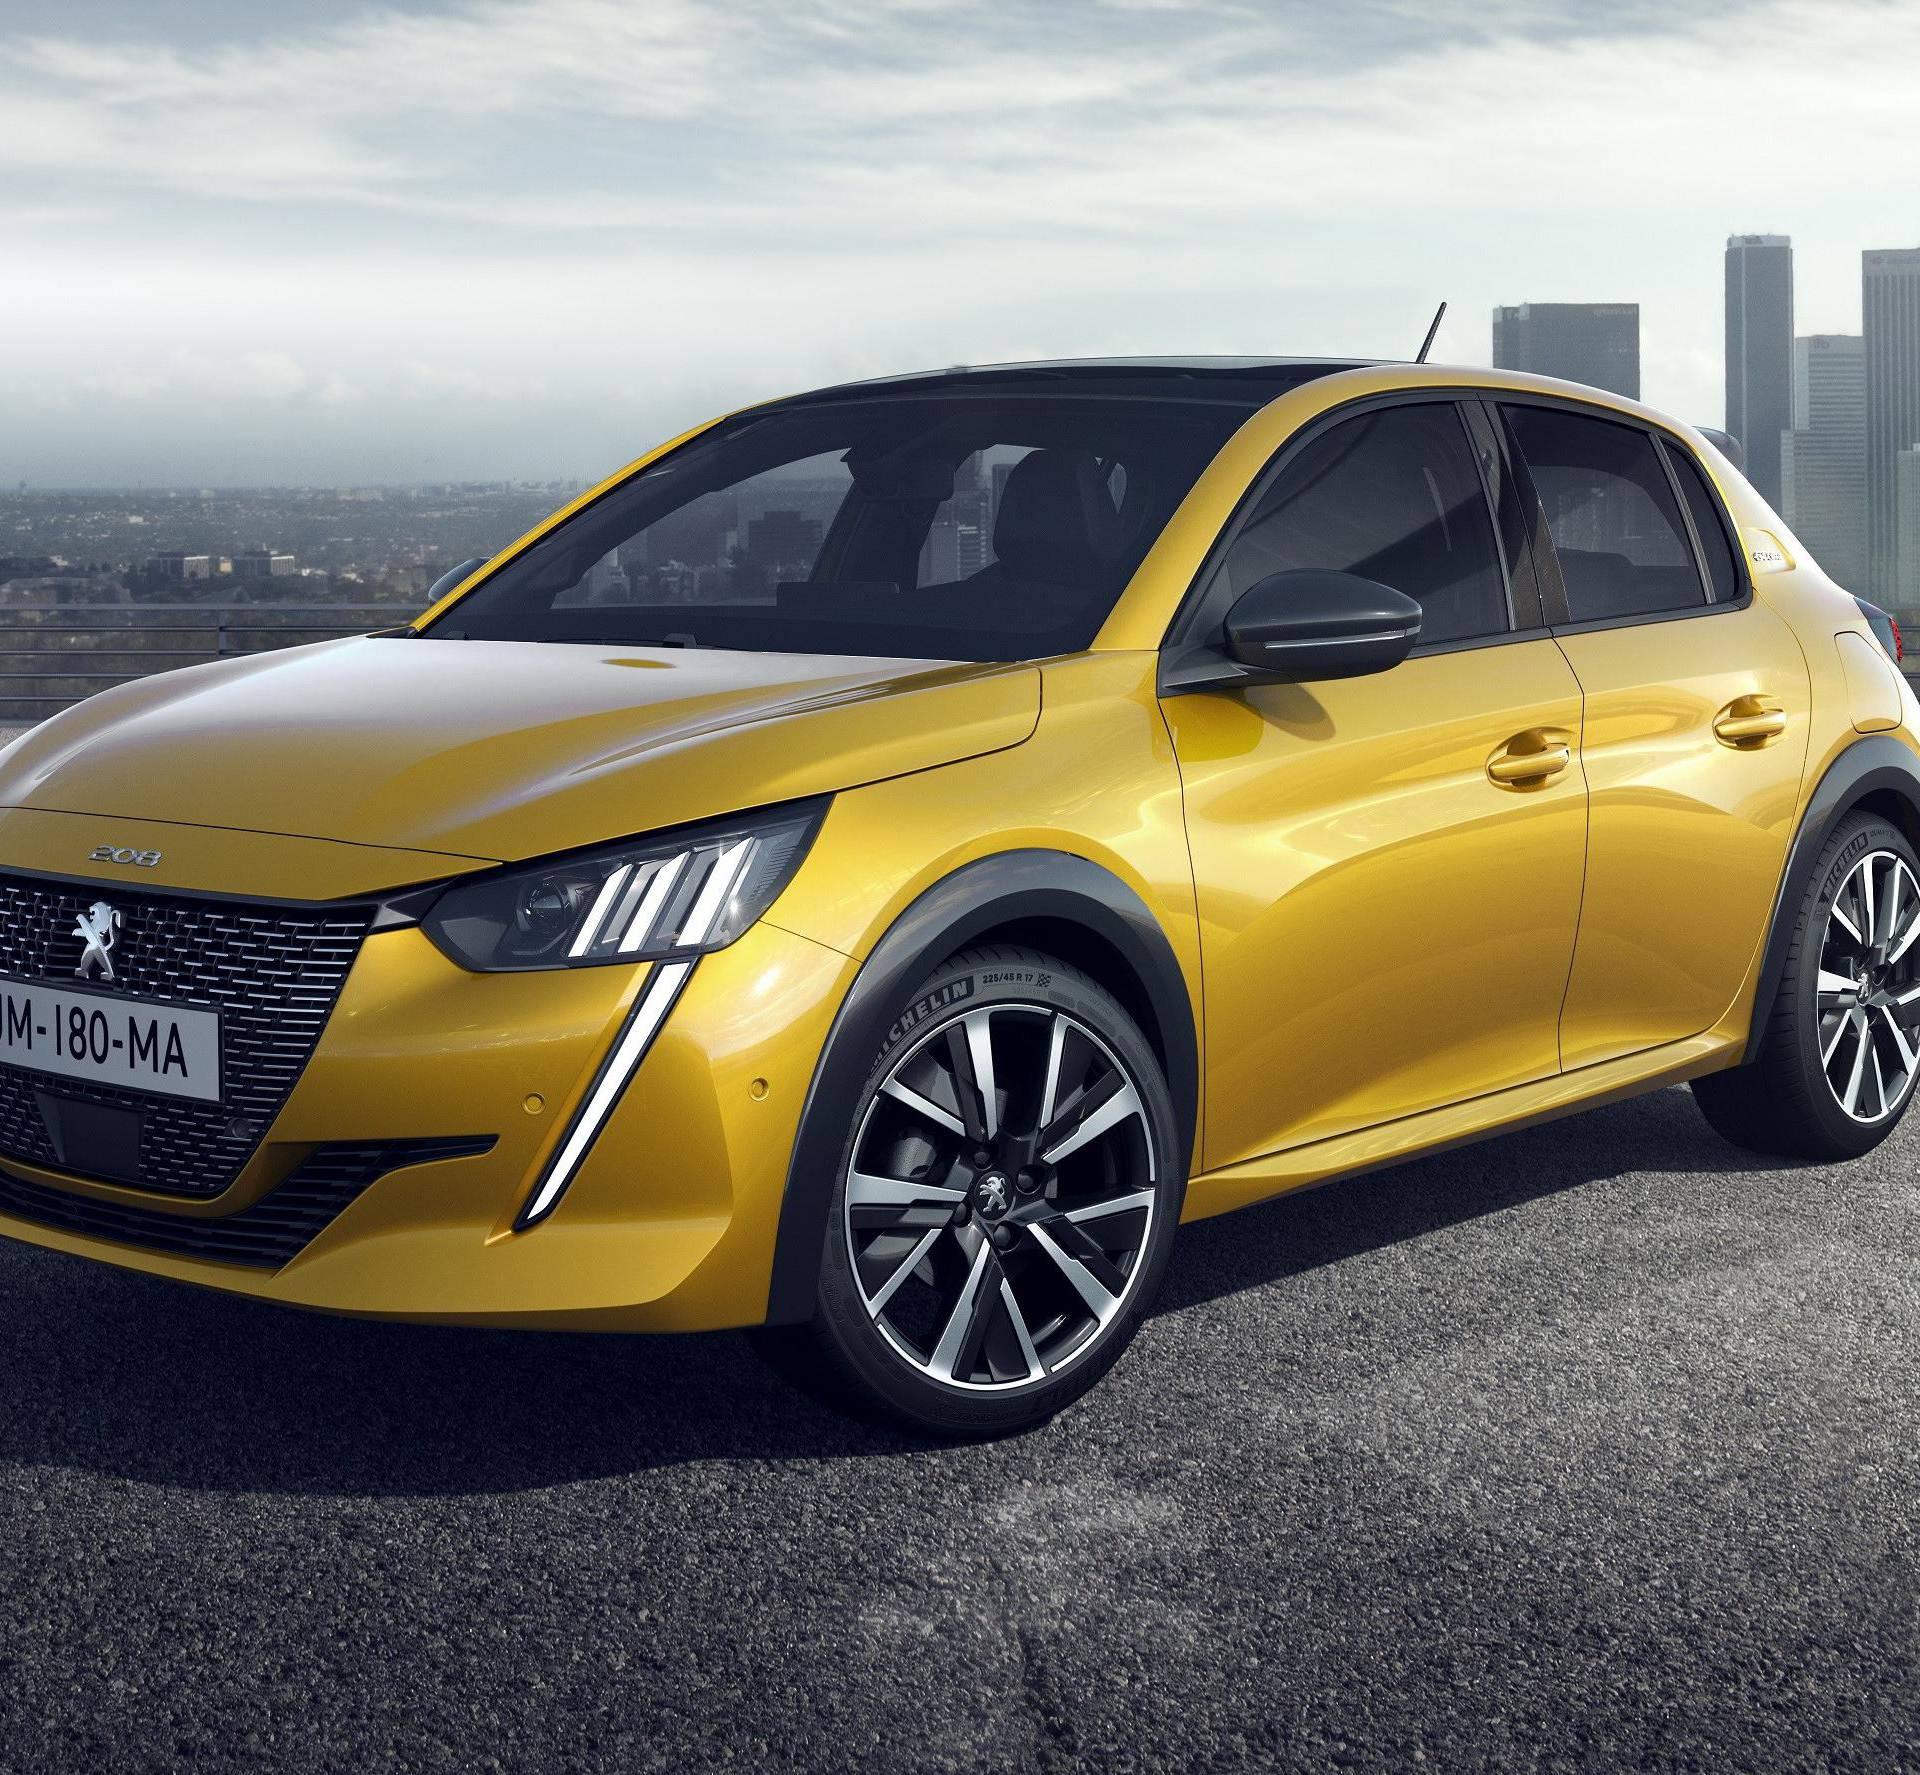 Kakav dizajn! Hoće li i novi Peugeot 208 pomesti tržište?